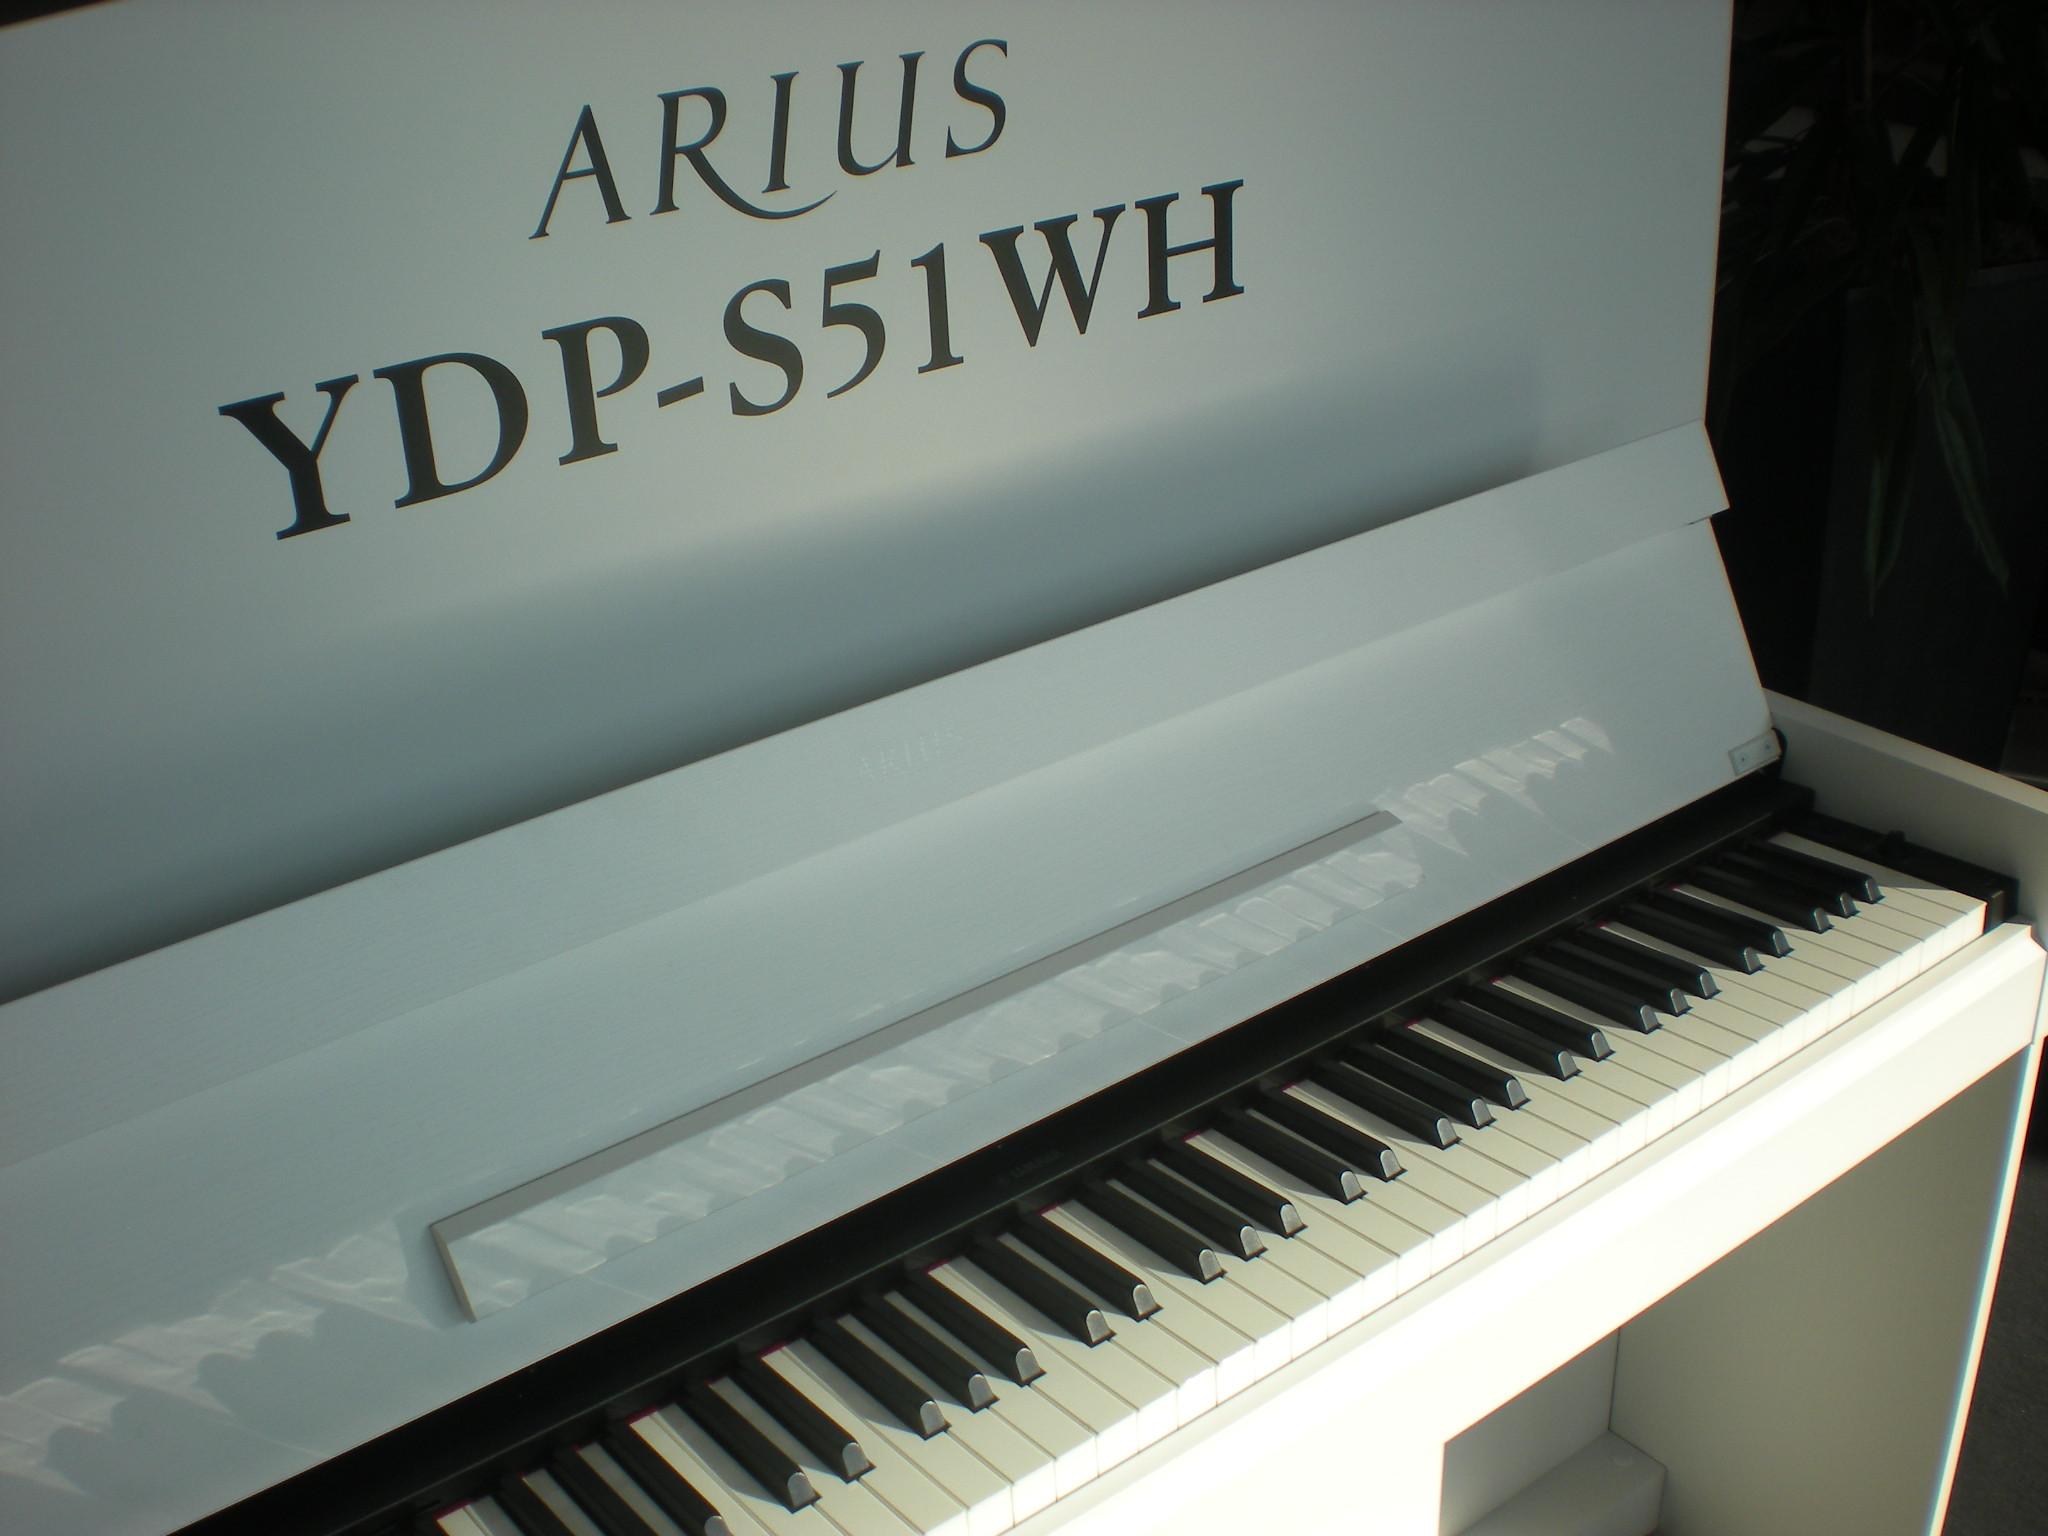 Yamaha Arius YDP-S51